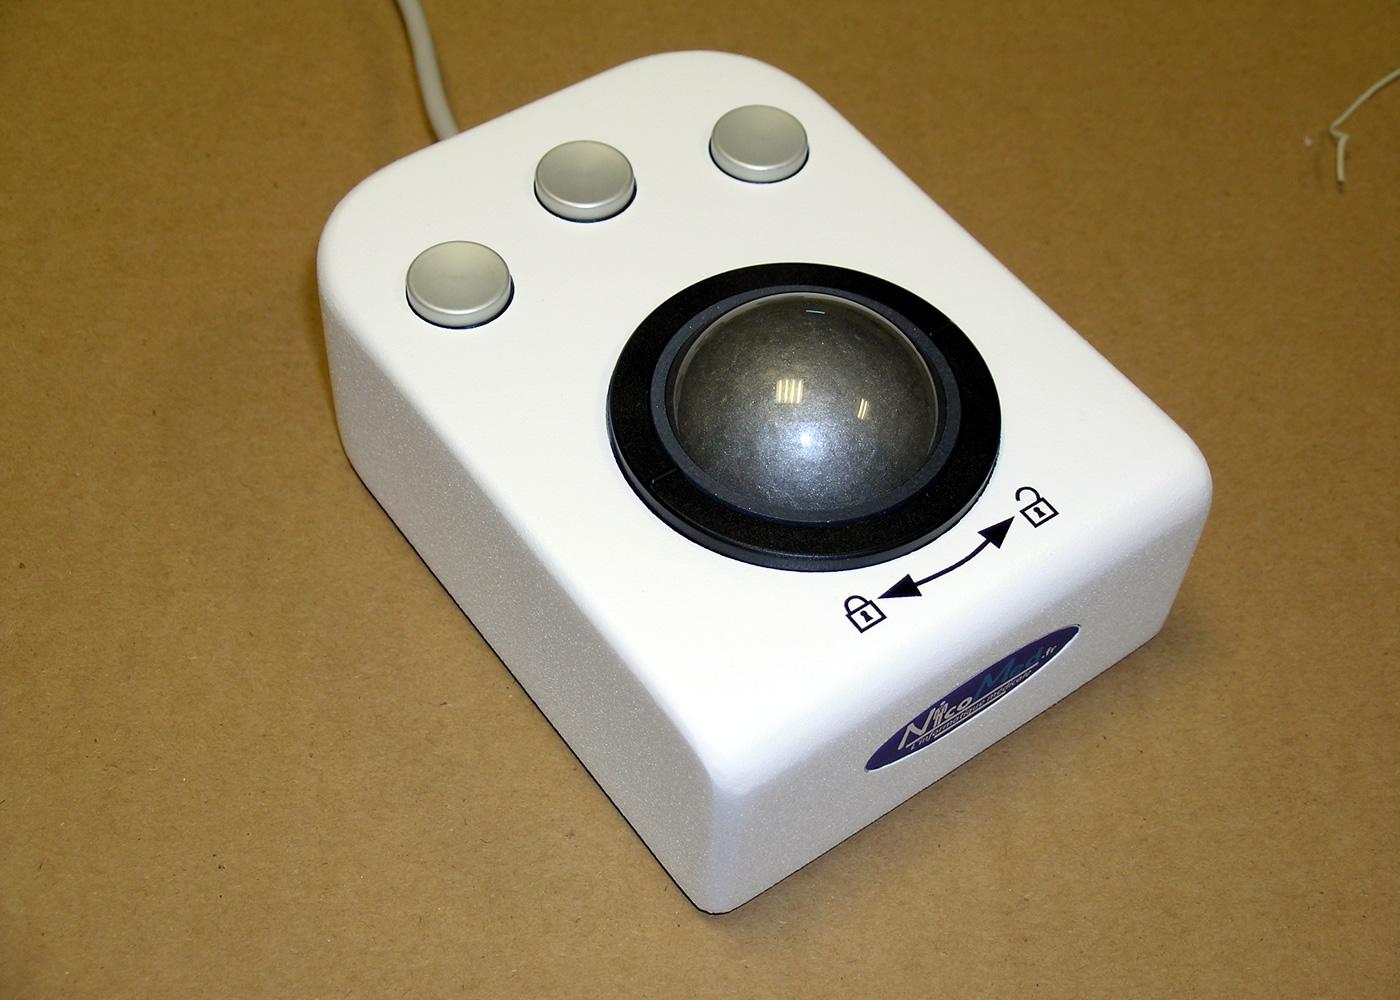 Trackball 50mm 3 boutons en boitier de table – Version boutons haut profil